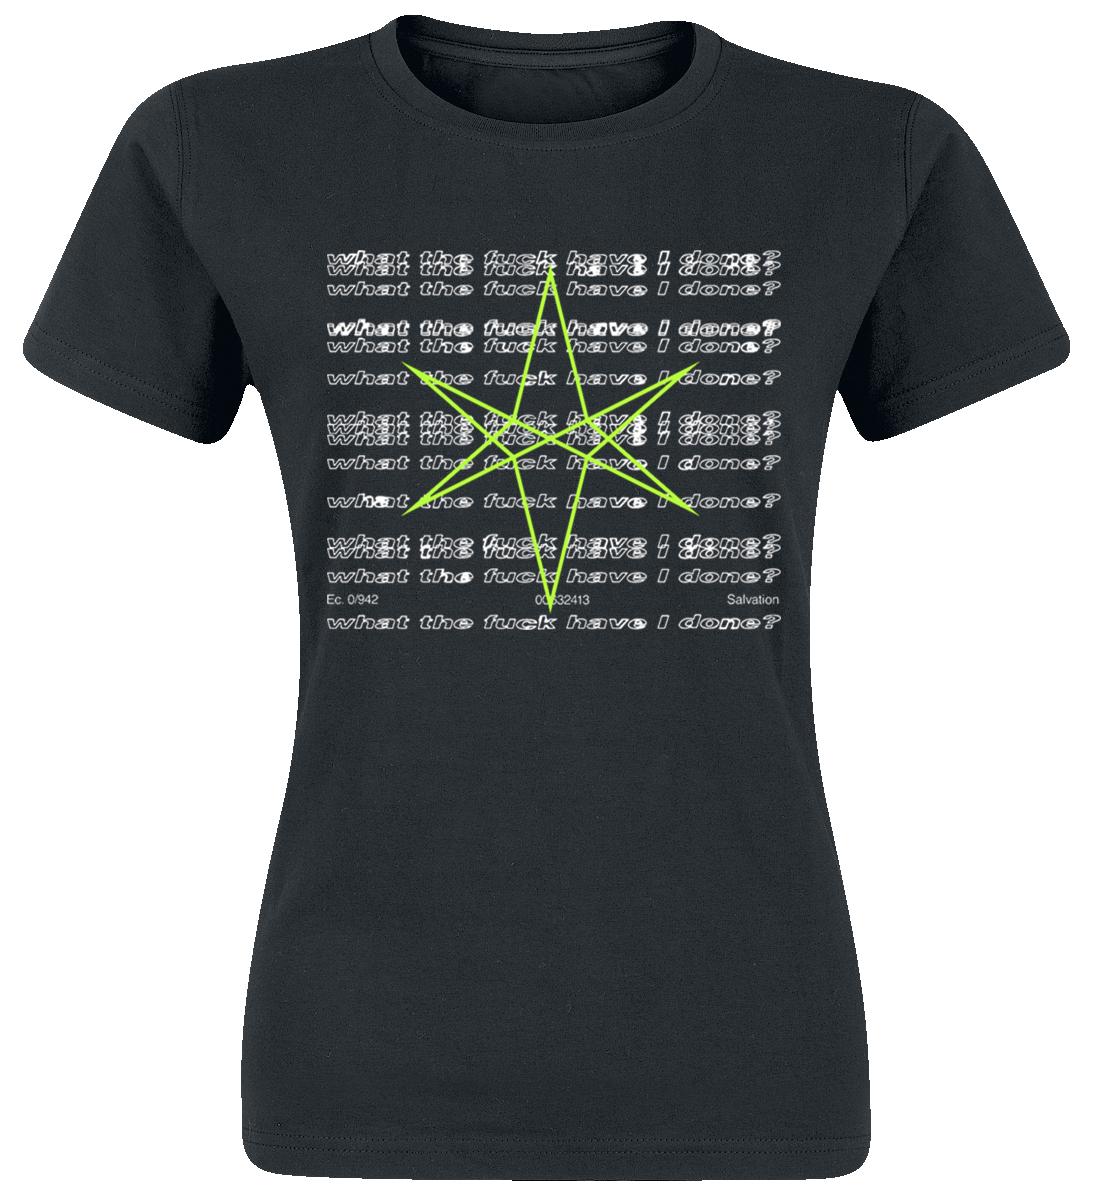 Bring Me The Horizon - WTF - Girls shirt - black image